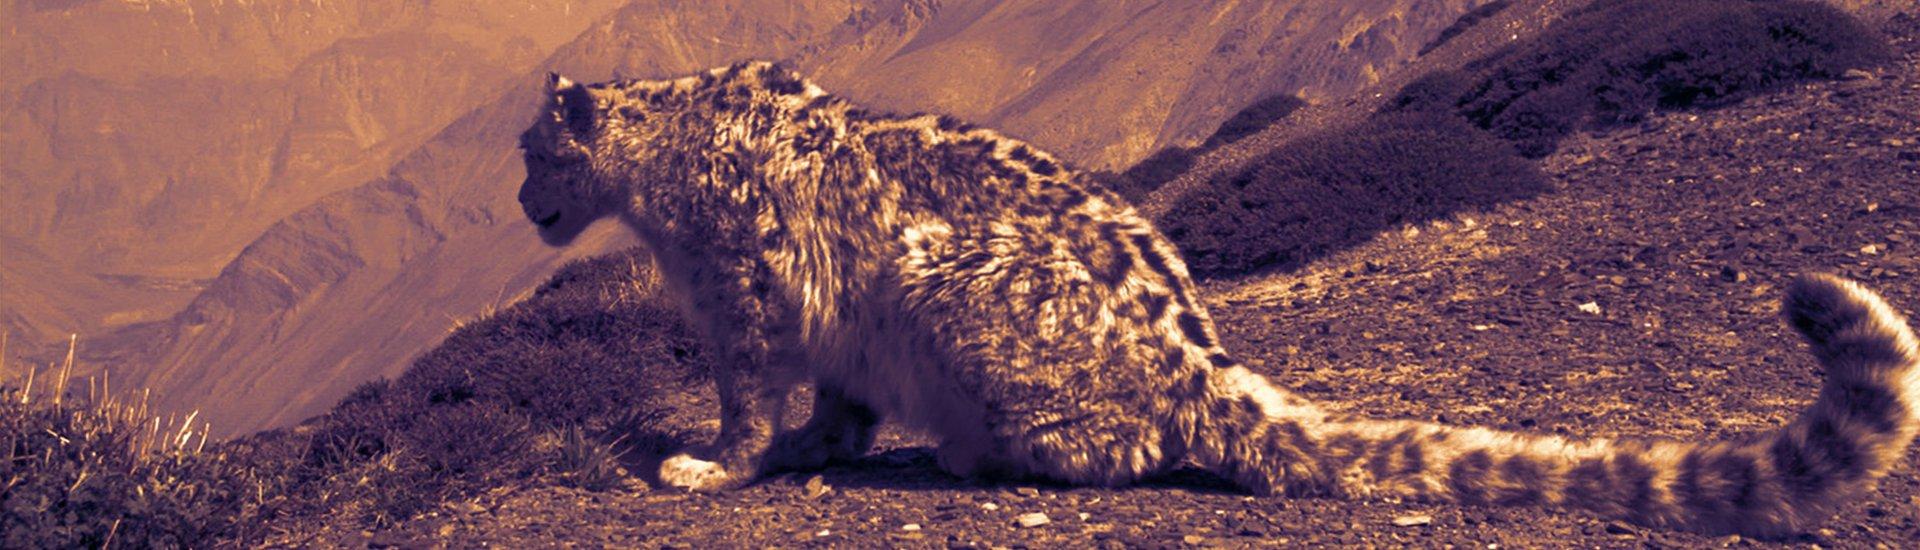 Snow leopard trek image